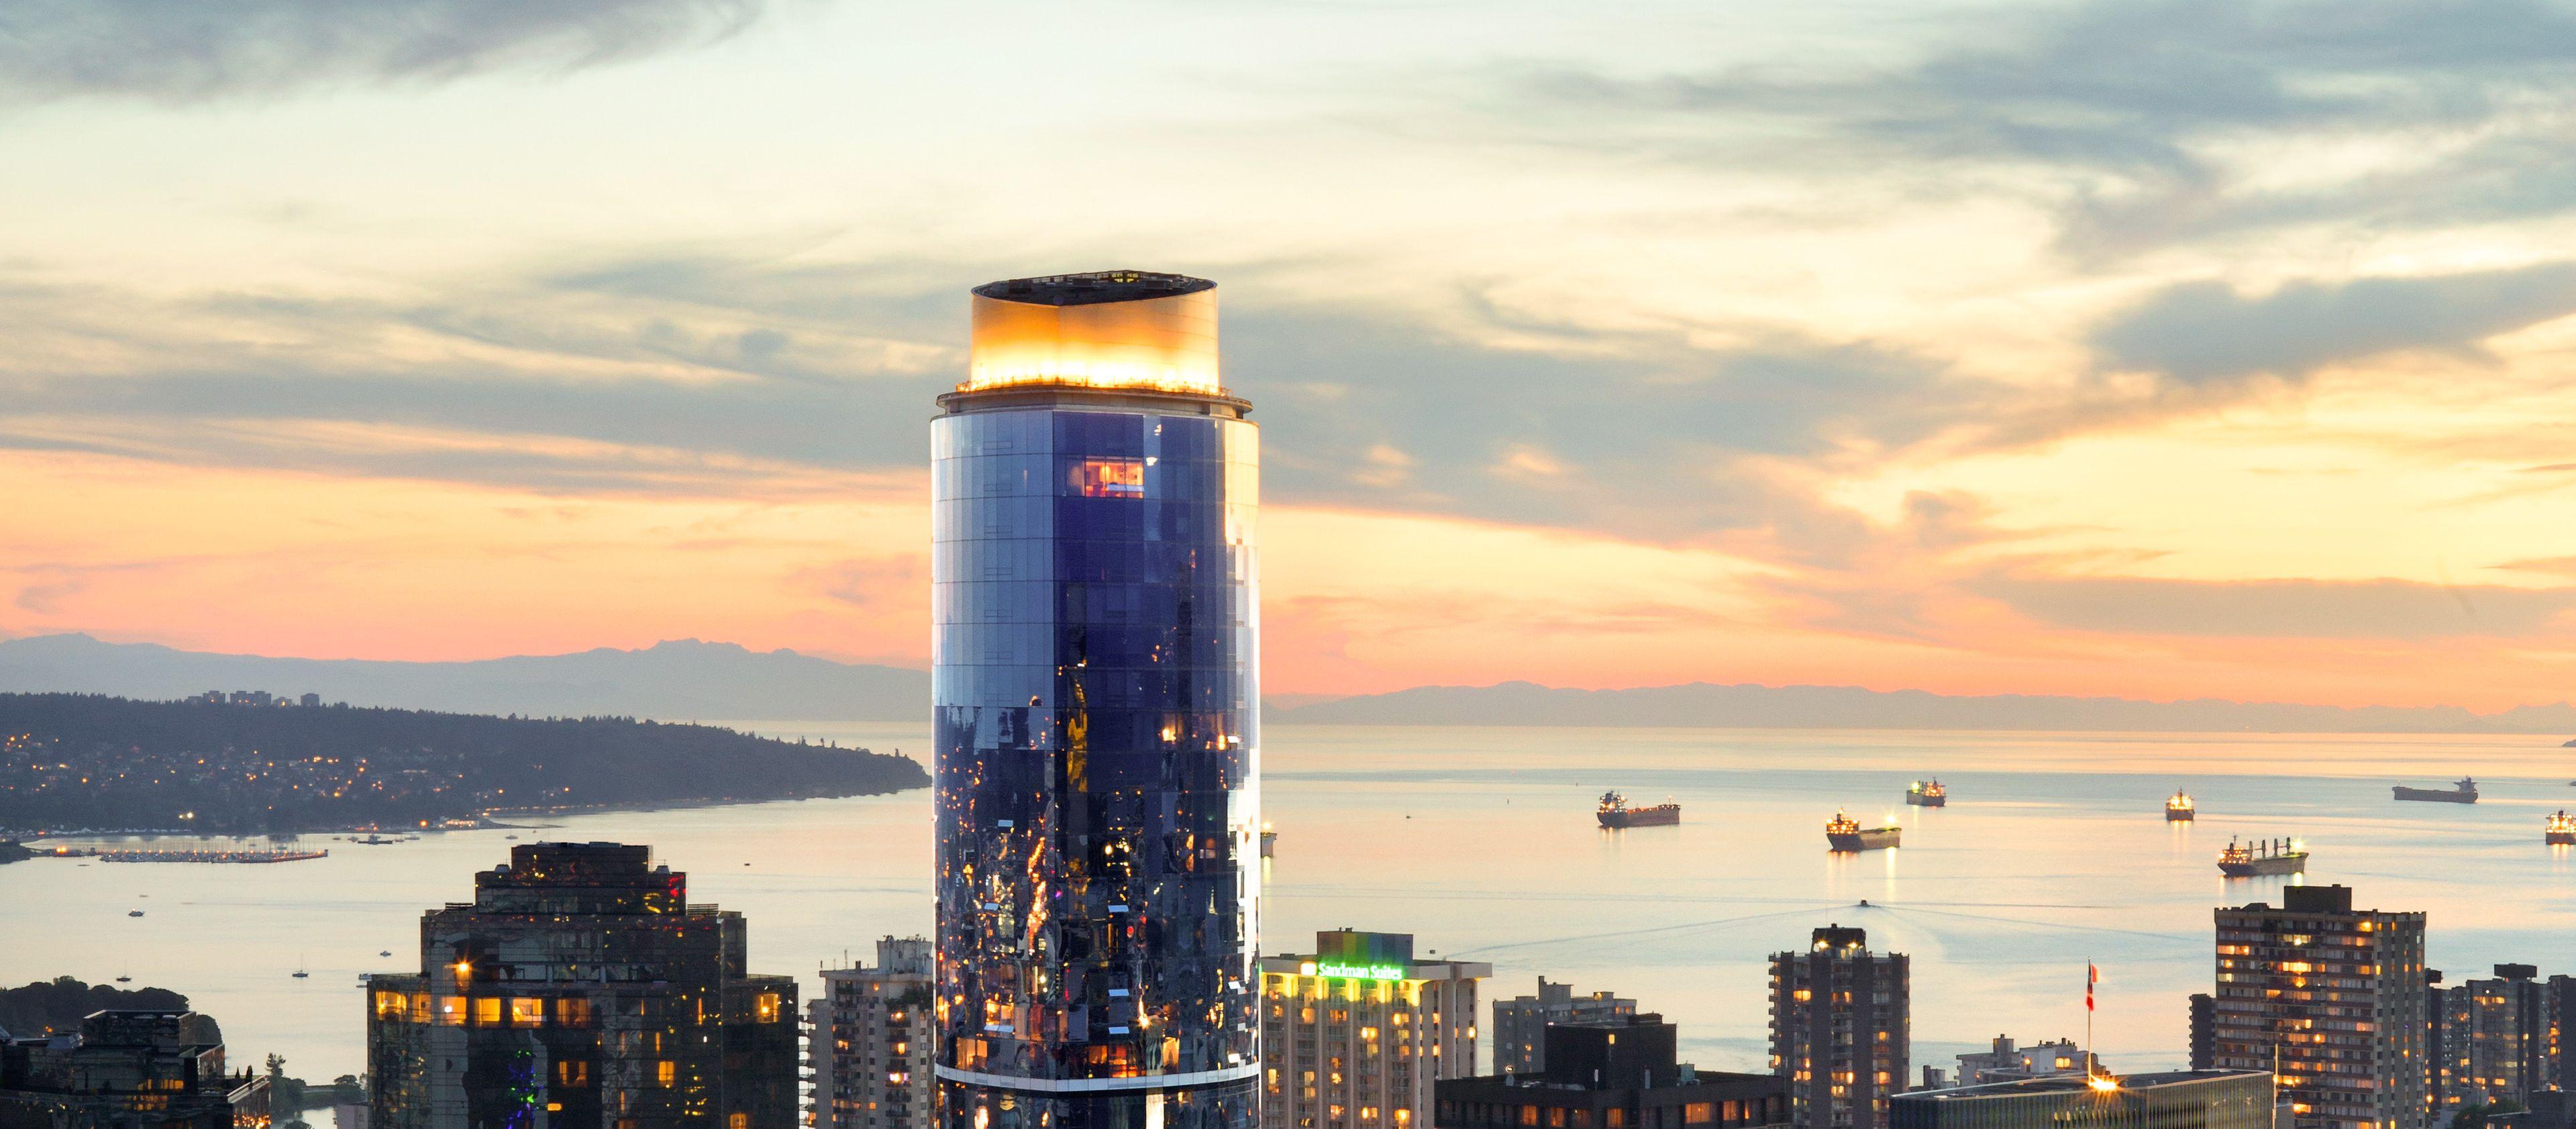 Das Sheraton Vancouver Wall Centre in Vancouver